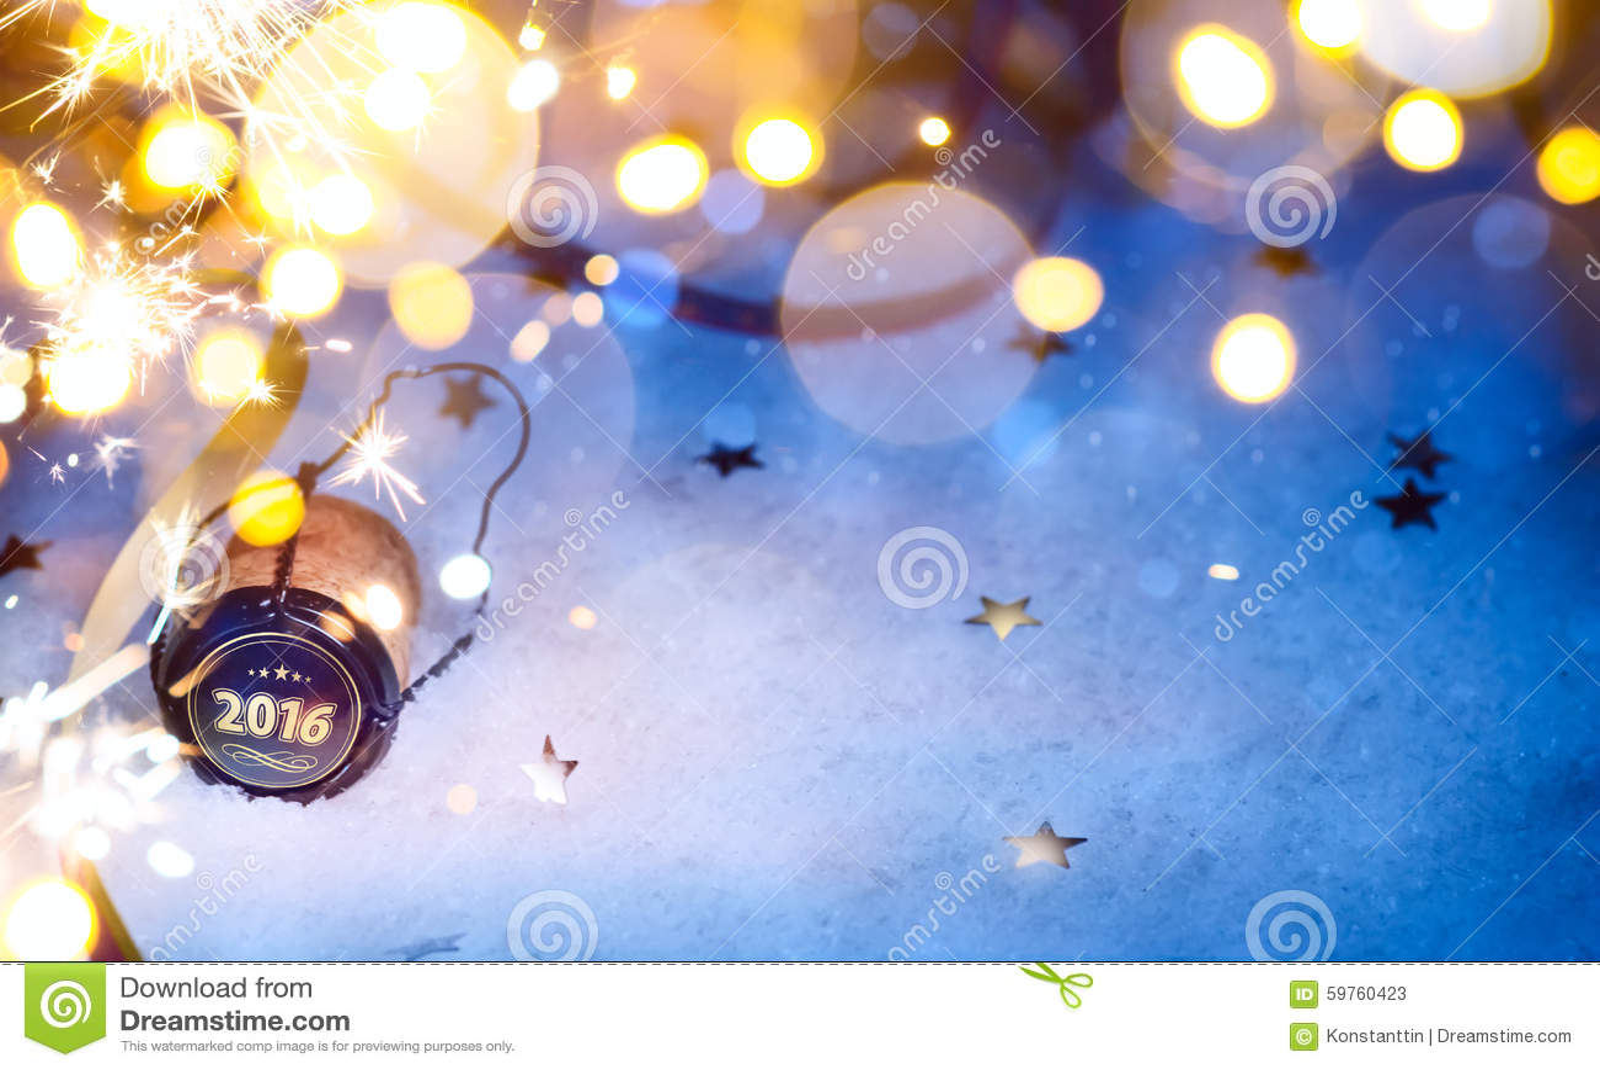 Christmas party movie-3762